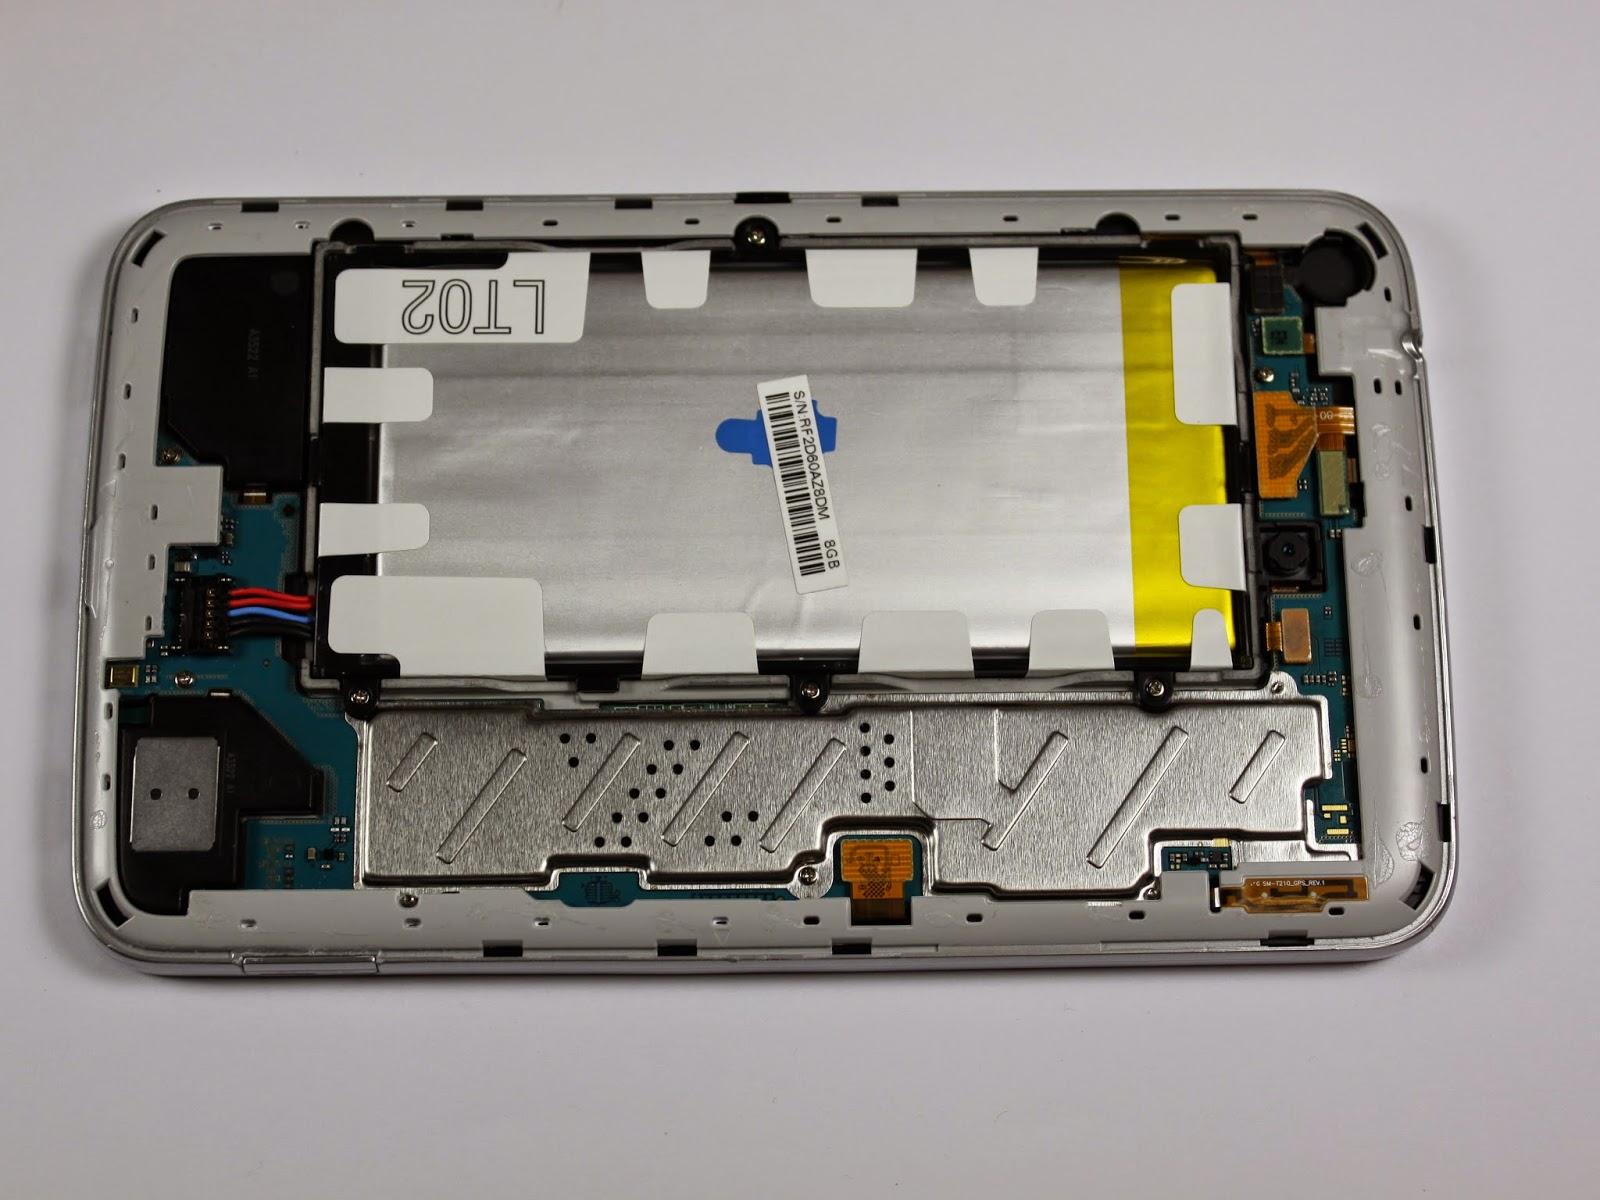 Замена аккумулятора в планшете самсунг своими руками